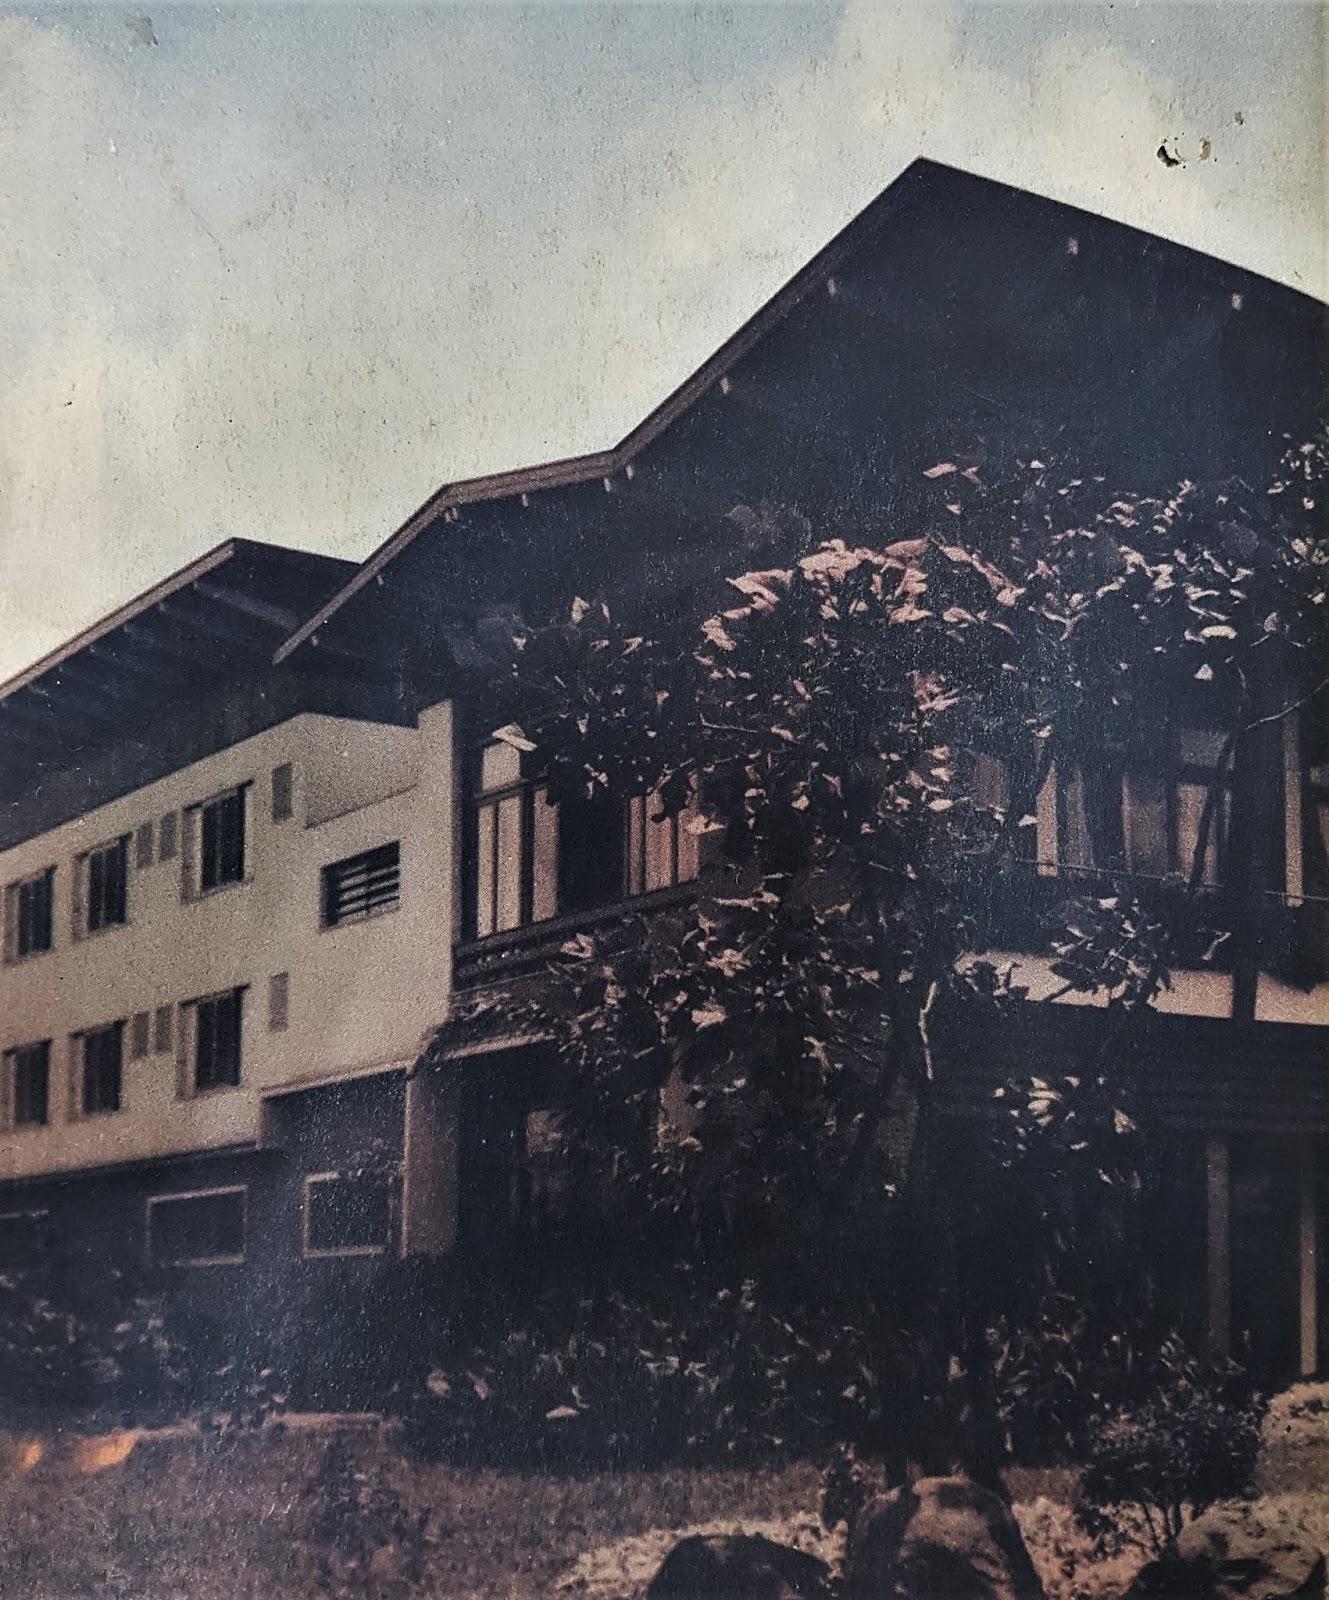 Grande Hotel Maringá - 1957